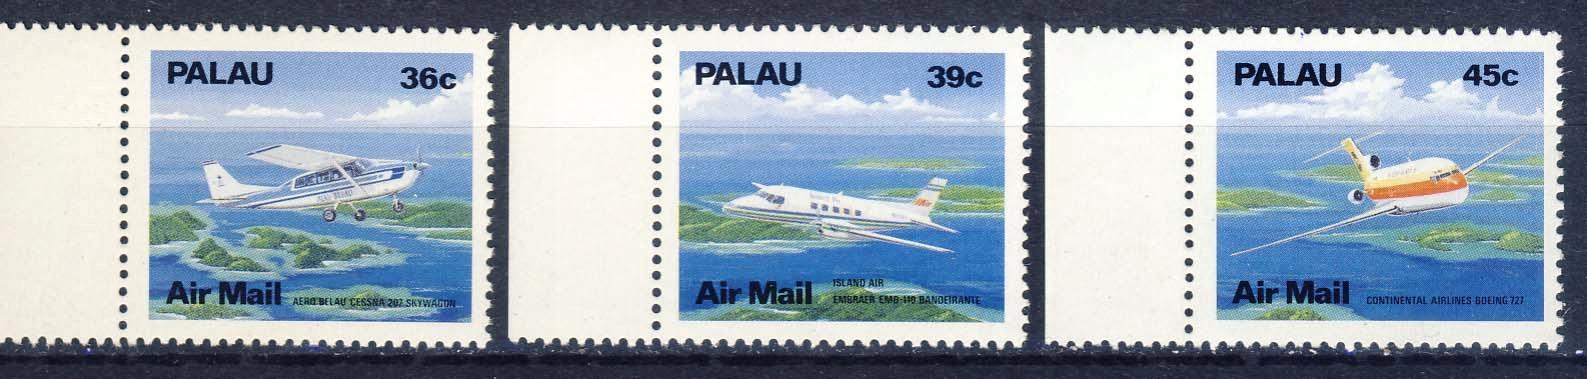 PALAU** Mi 278-80 Lotnictwo, samoloty